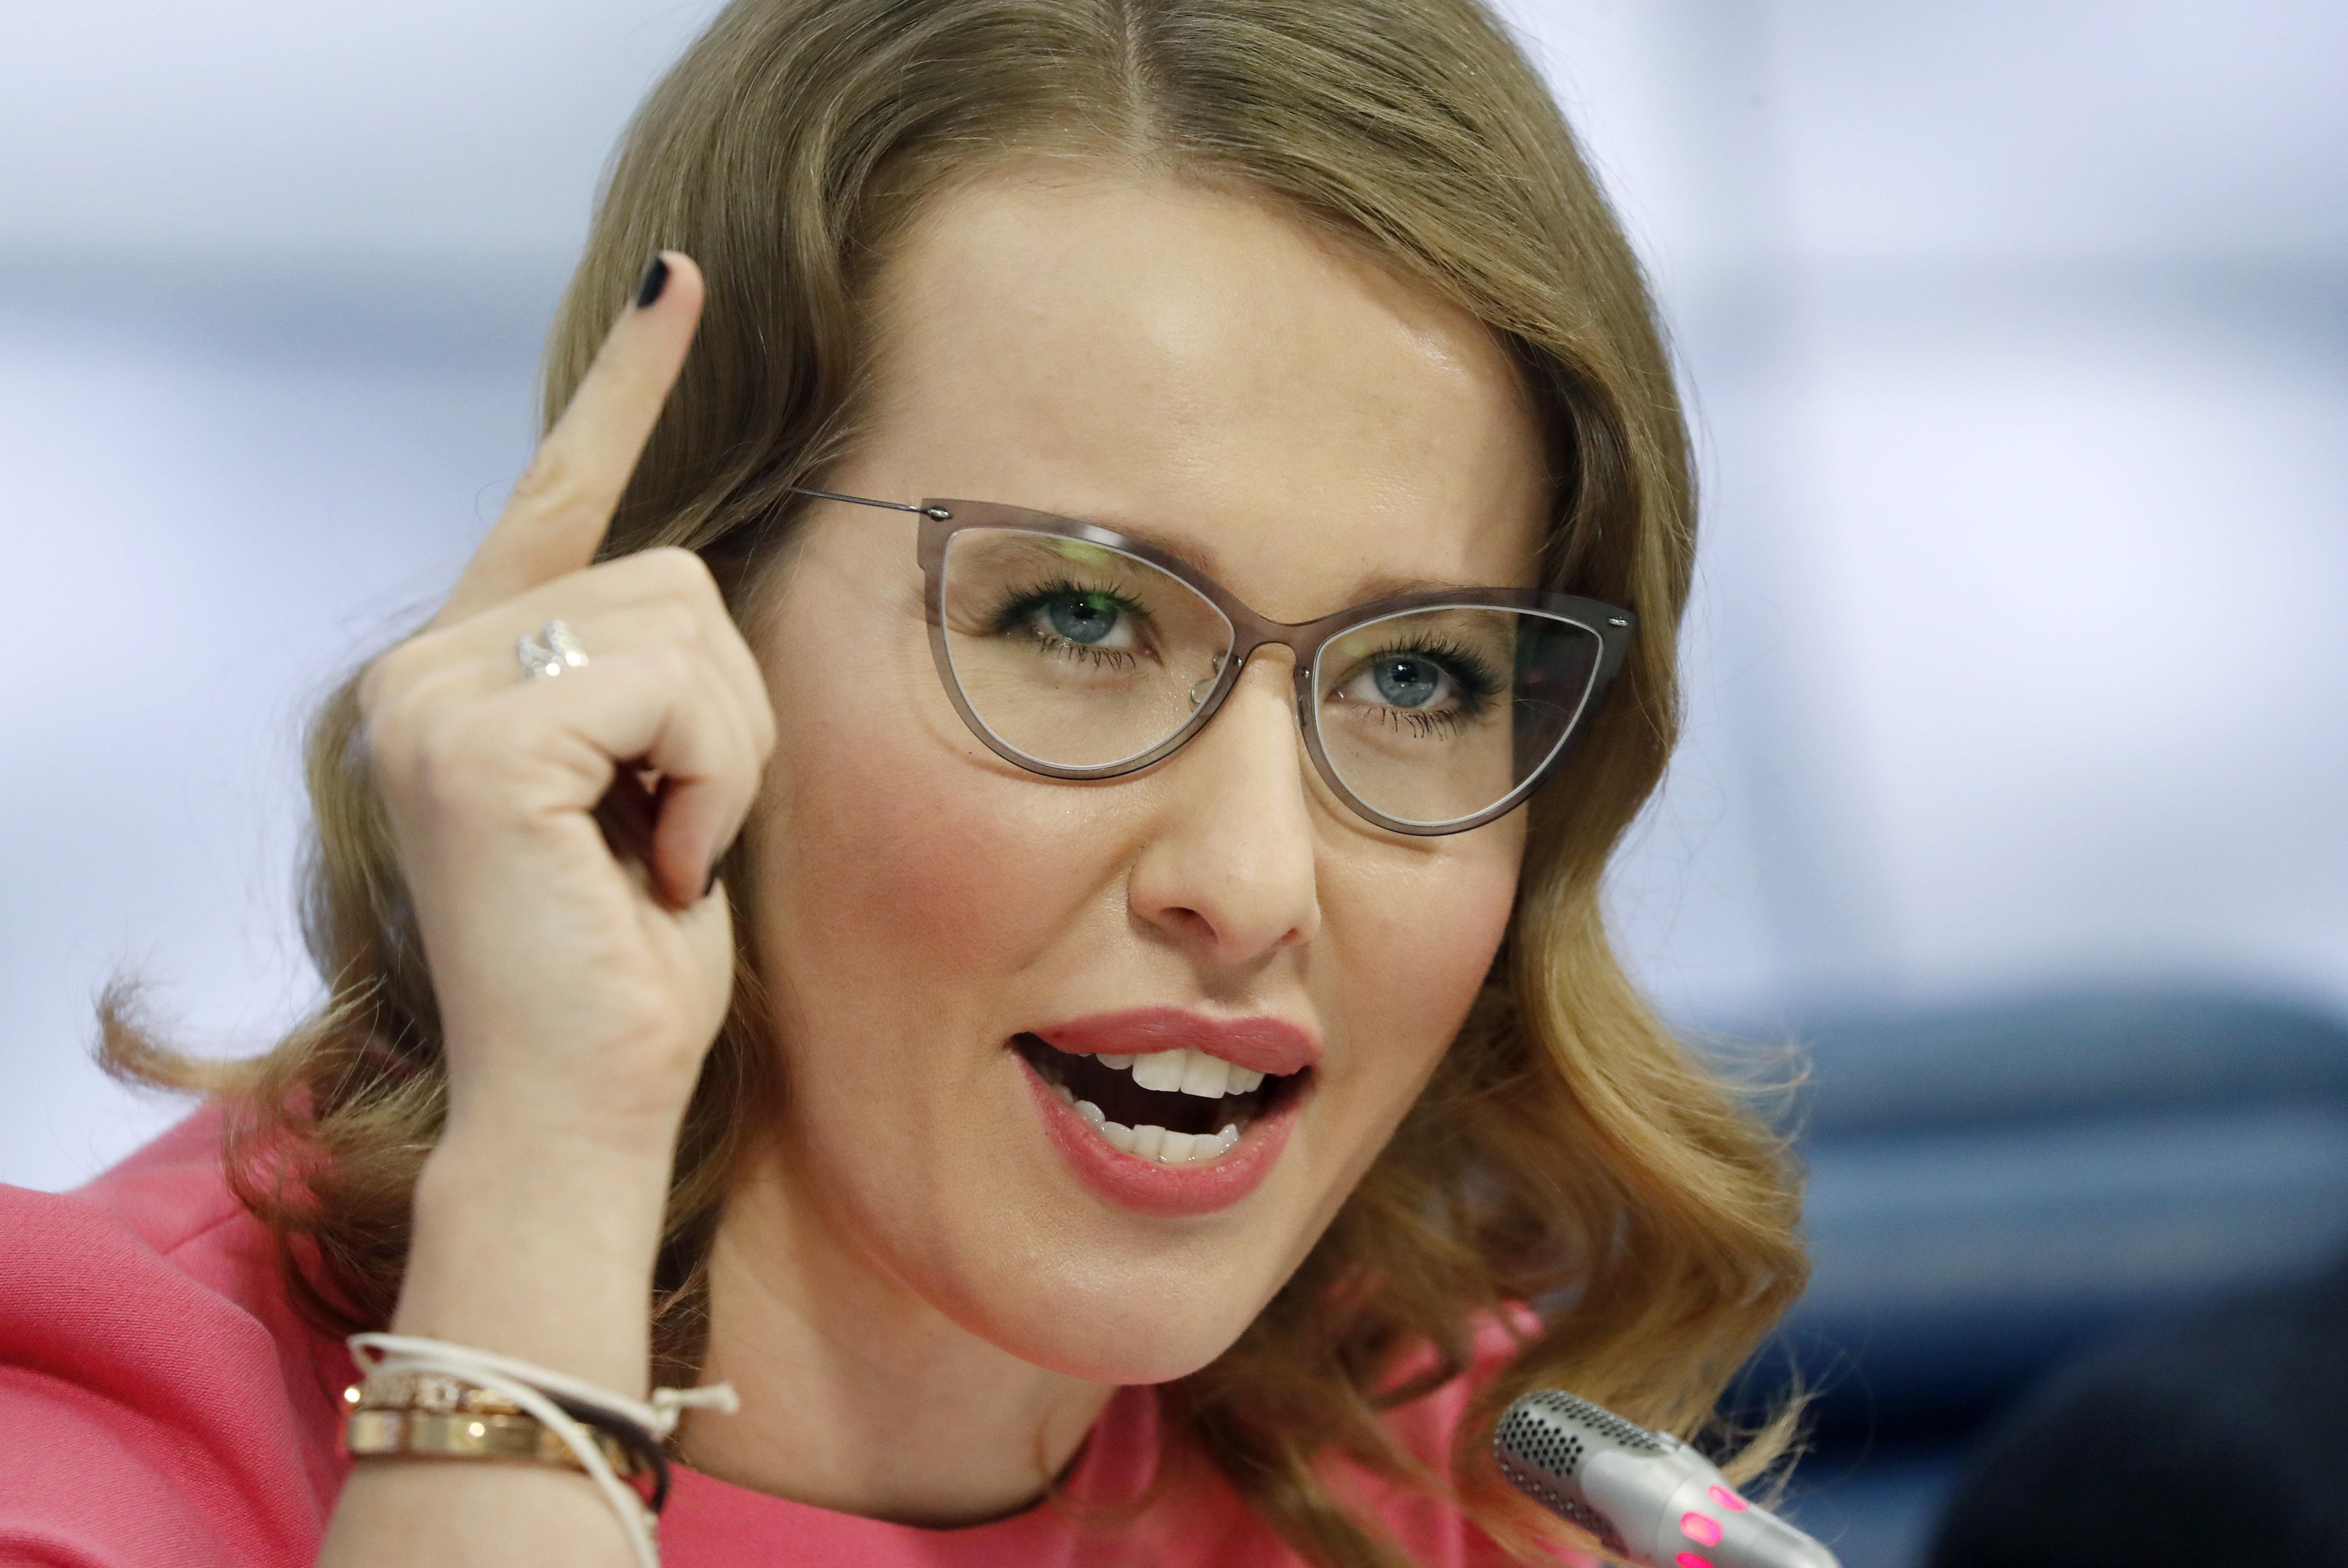 Ksenia Sobchak tempers 2-month-old son